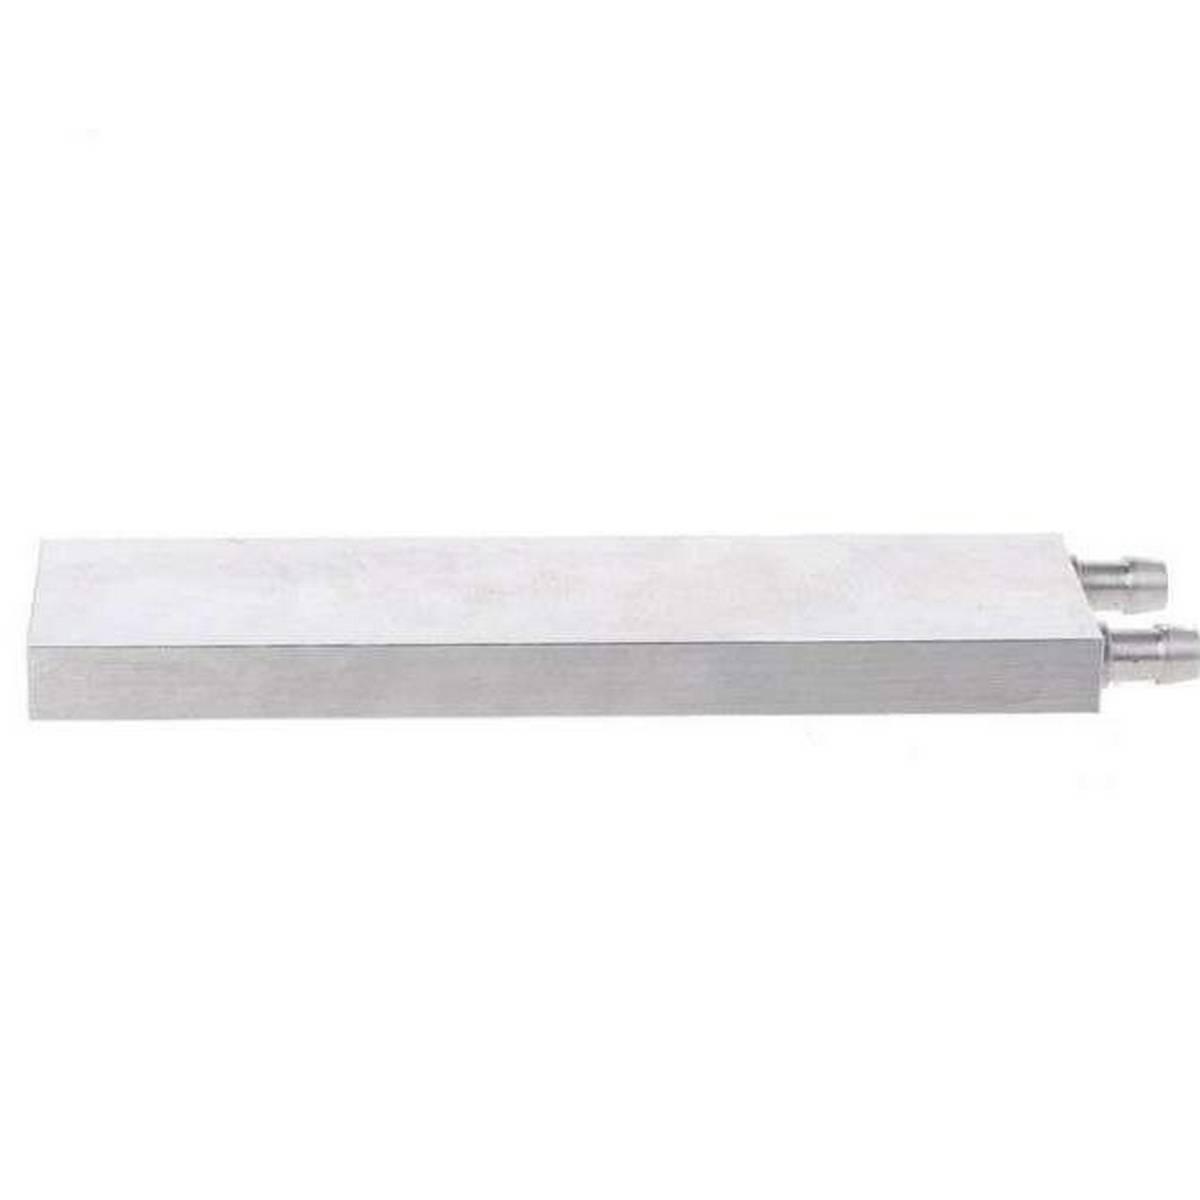 Aluminum Water Cooling Block 40*160mm Primary Aluminum Water Cooling Block Heat Sink System For PC Laptop CPU